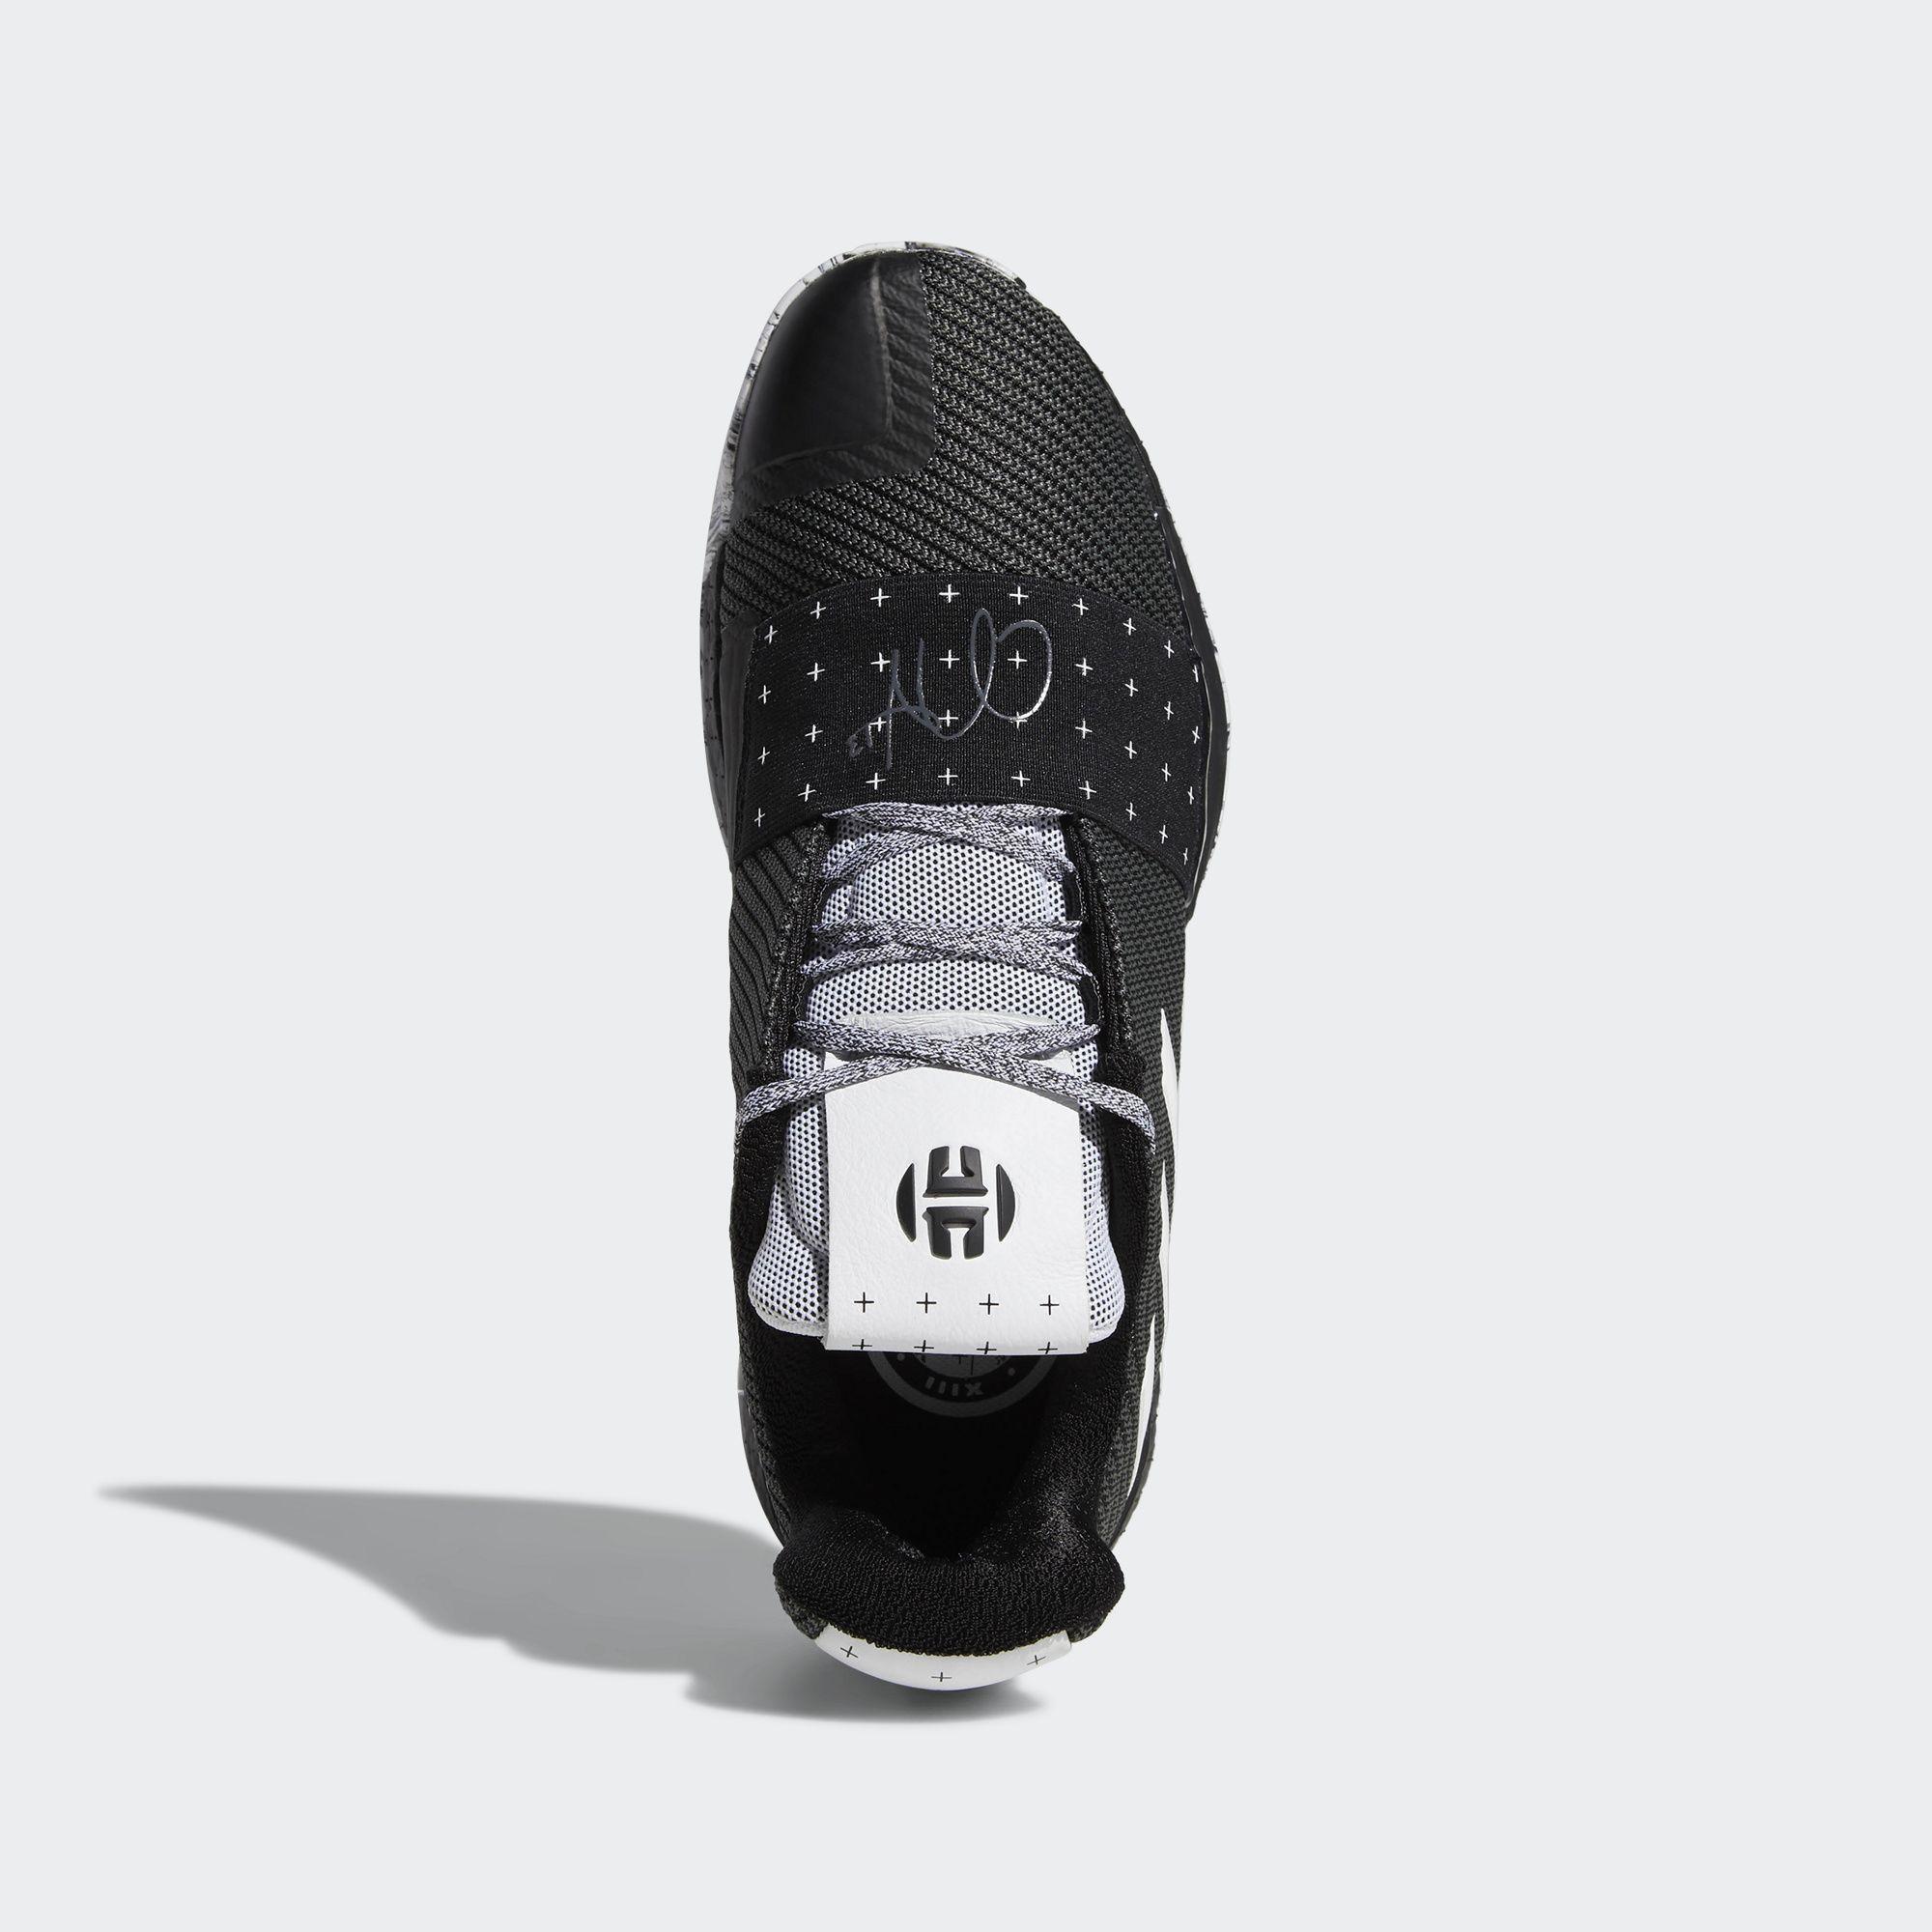 adidas harden vol 3 release date james harden